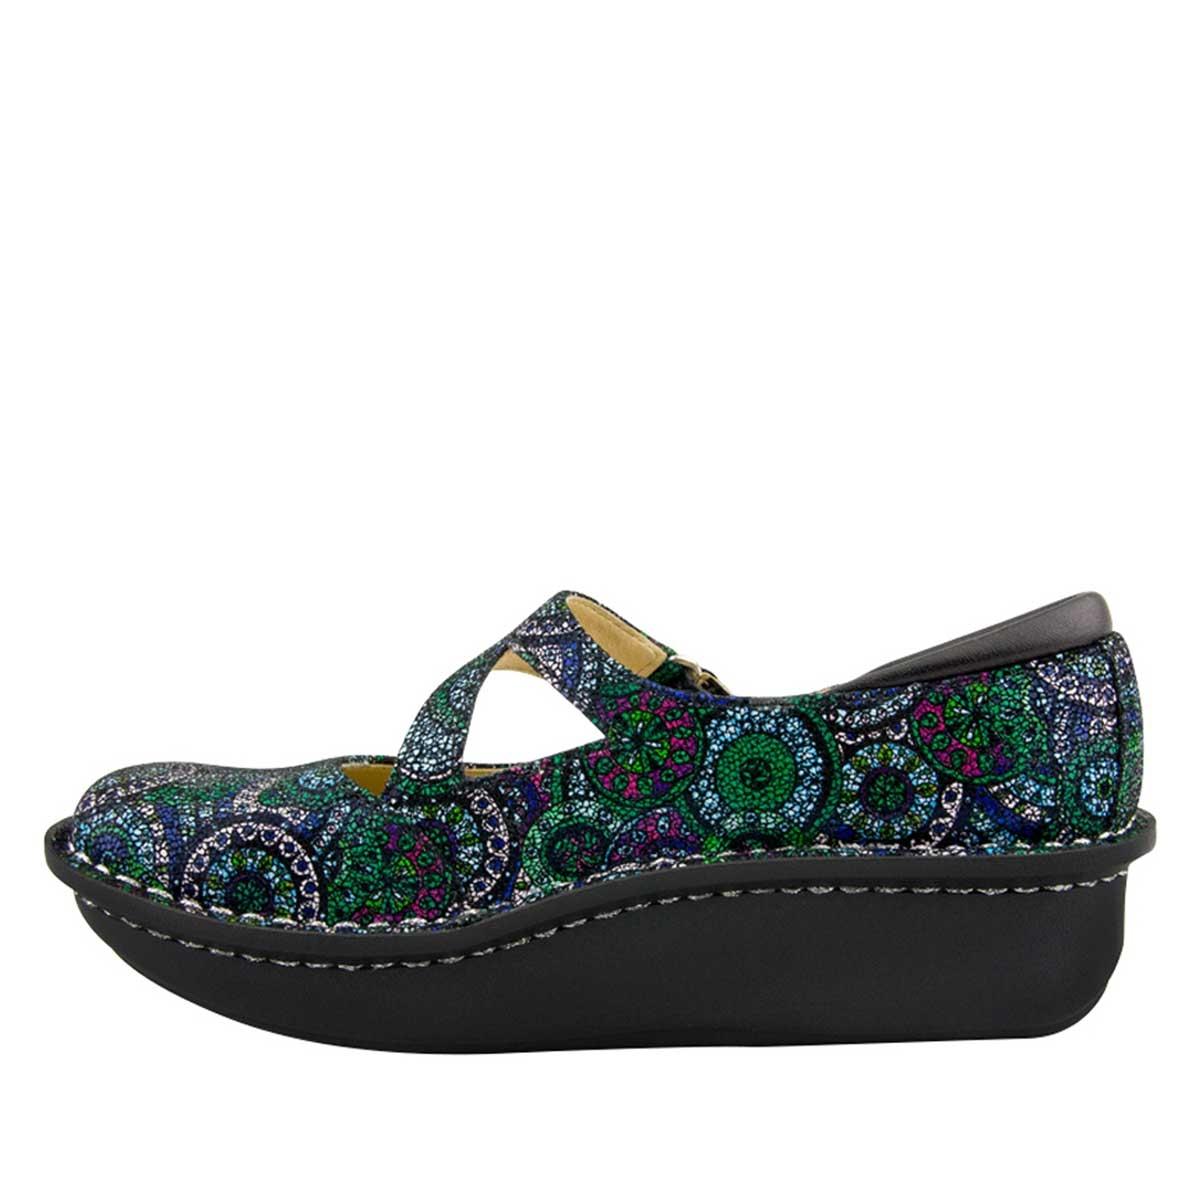 Nurse Alegria Dayna Spiro Blues  The Alegria Shoe Experts